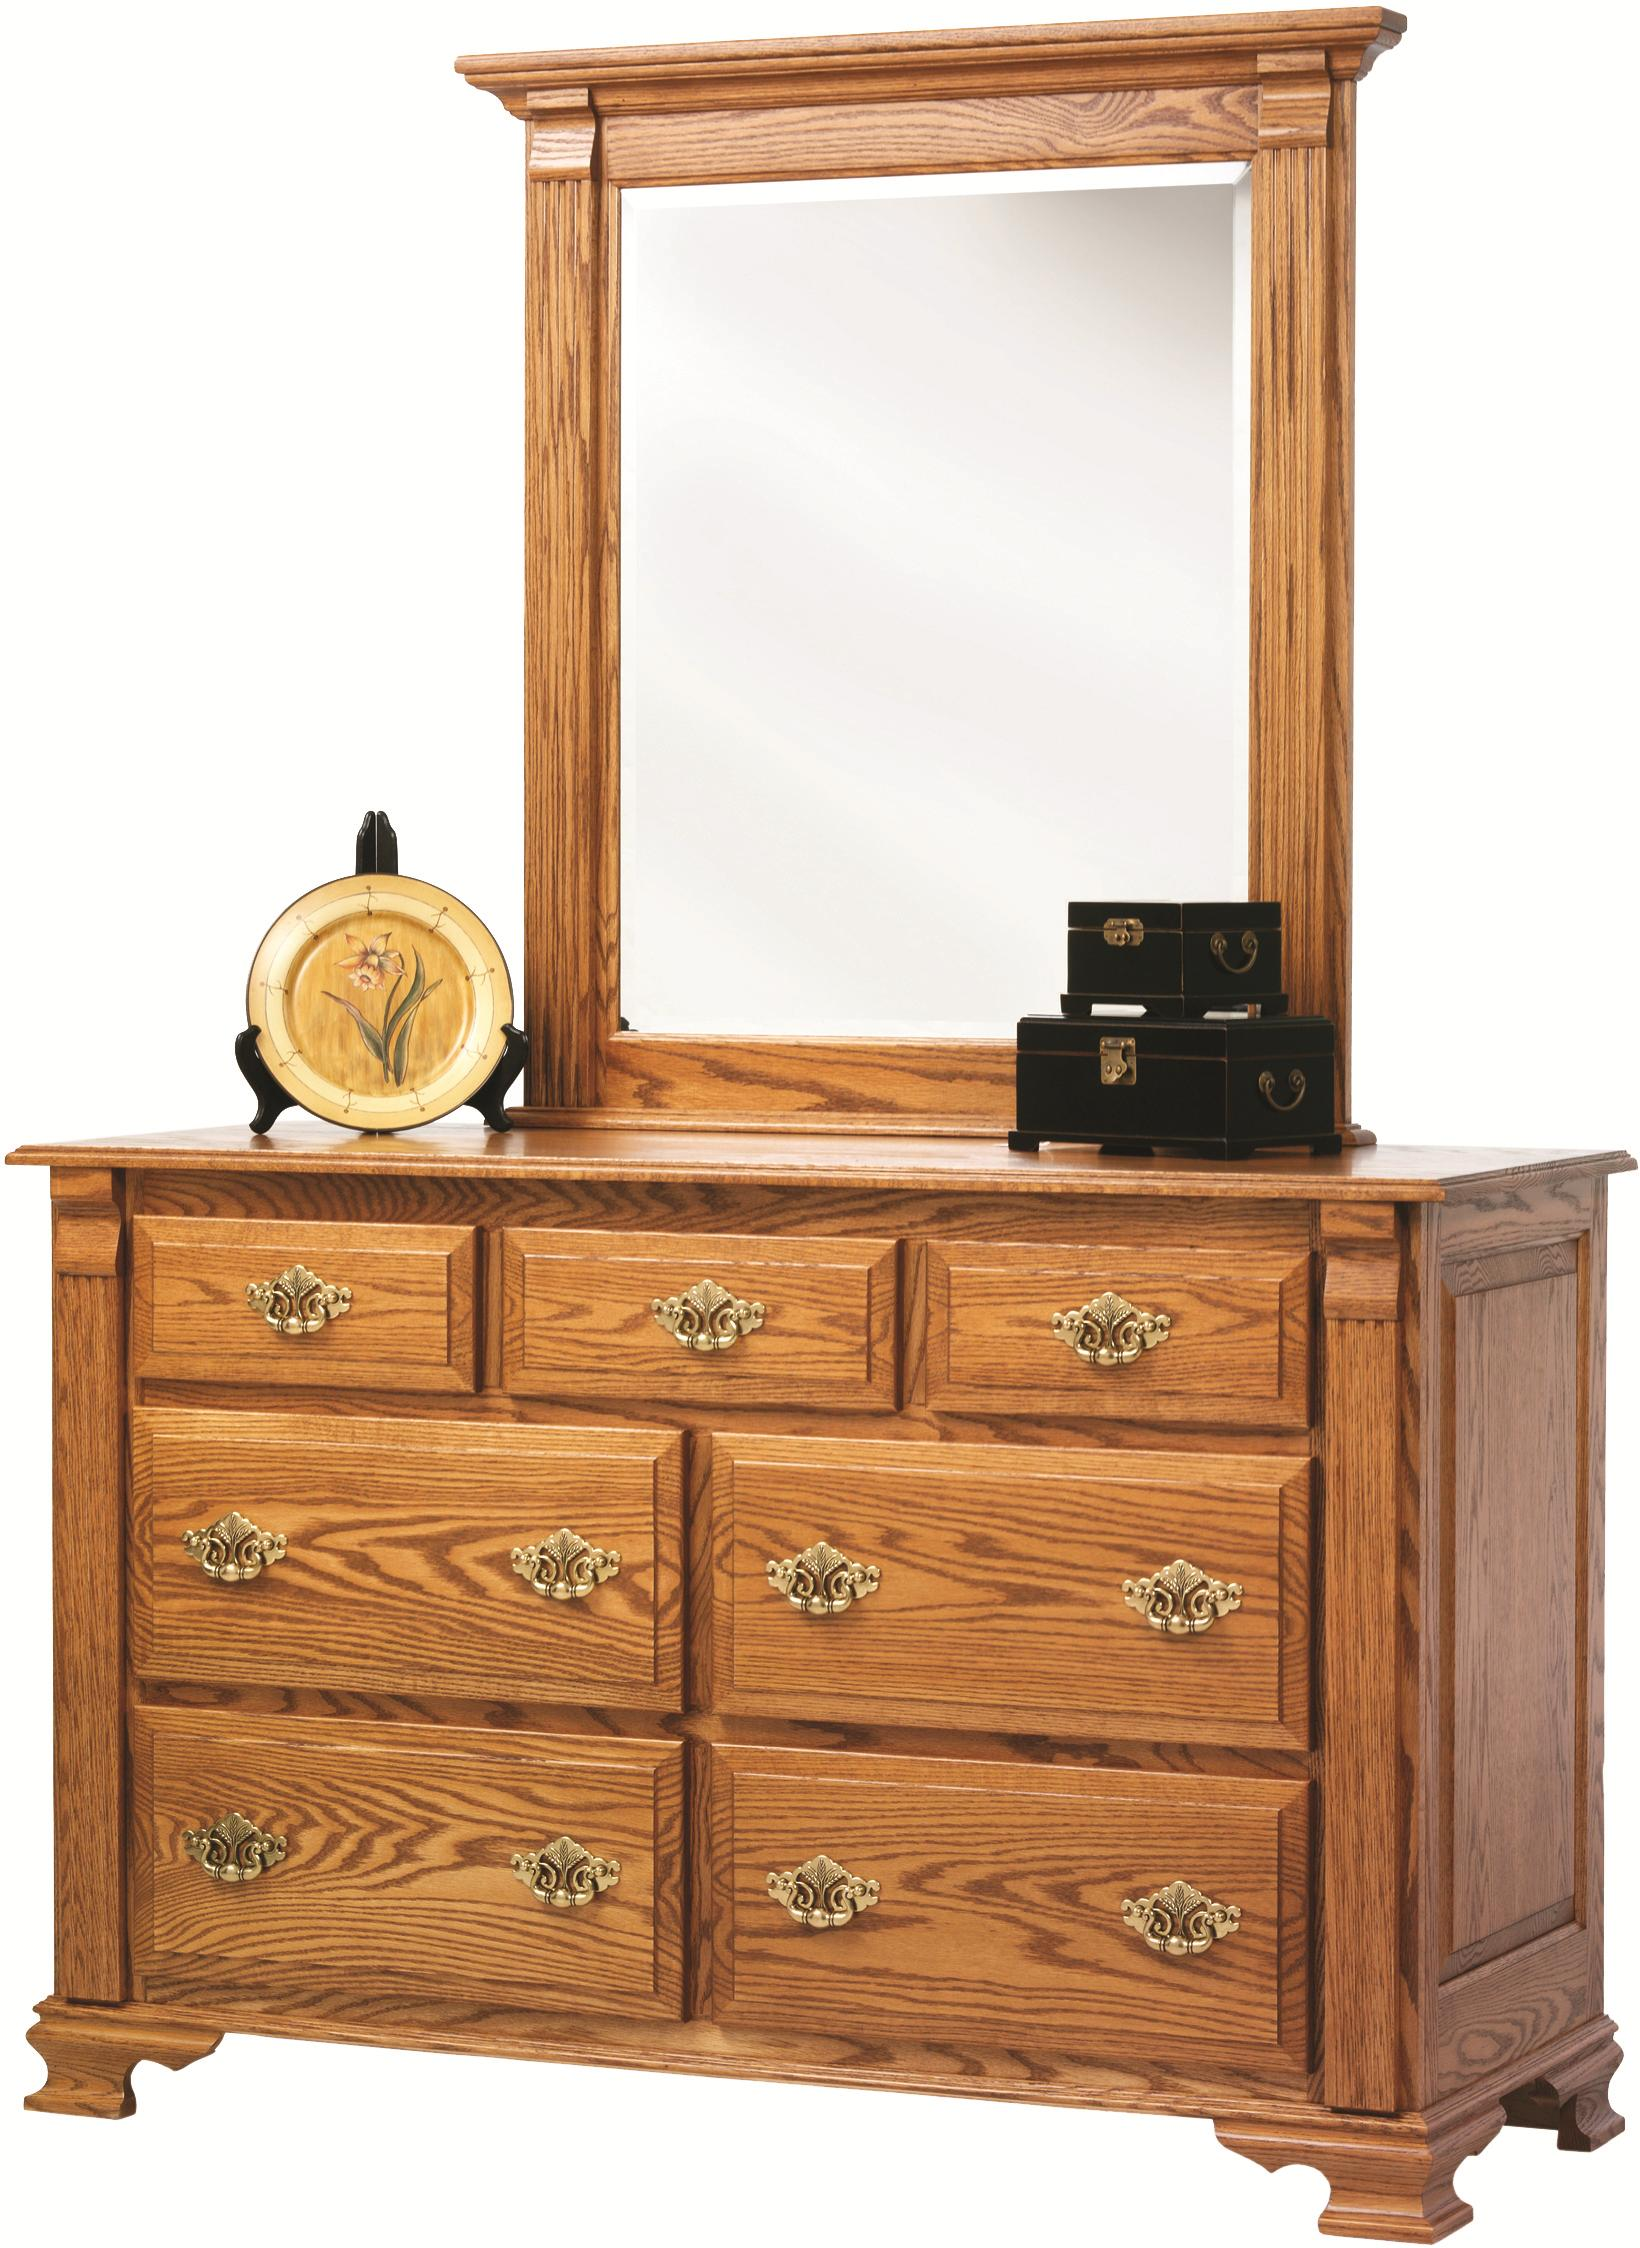 Journeys End Dresser + Mirror by Millcraft at Saugerties Furniture Mart